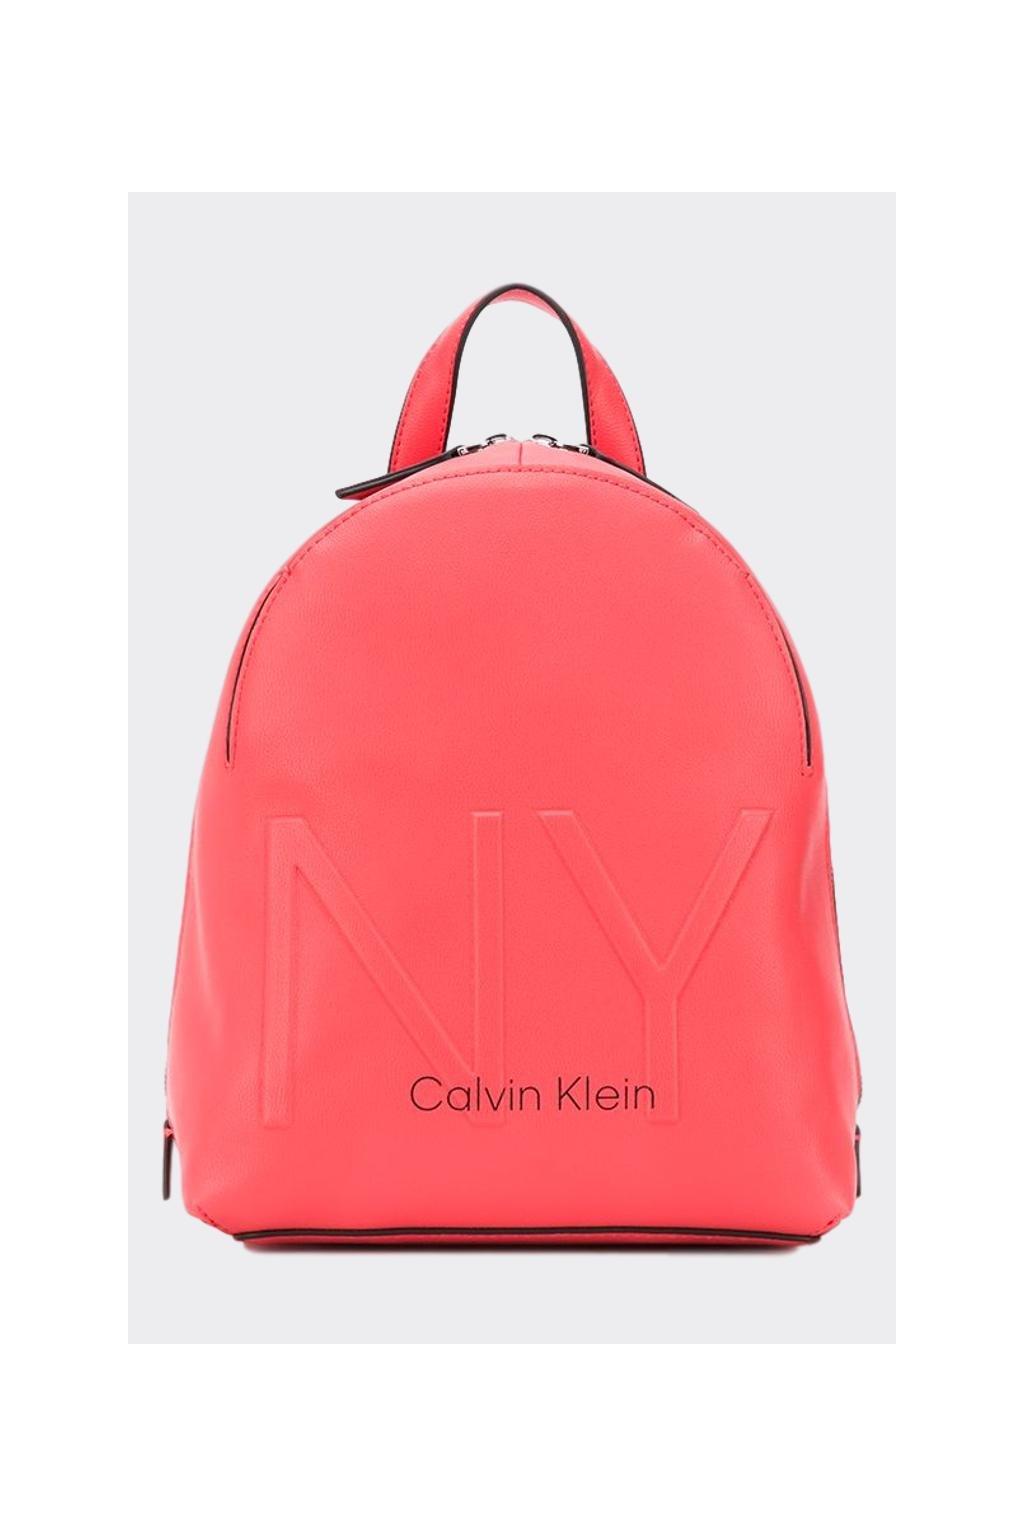 Calvin Klein batoh - korálová